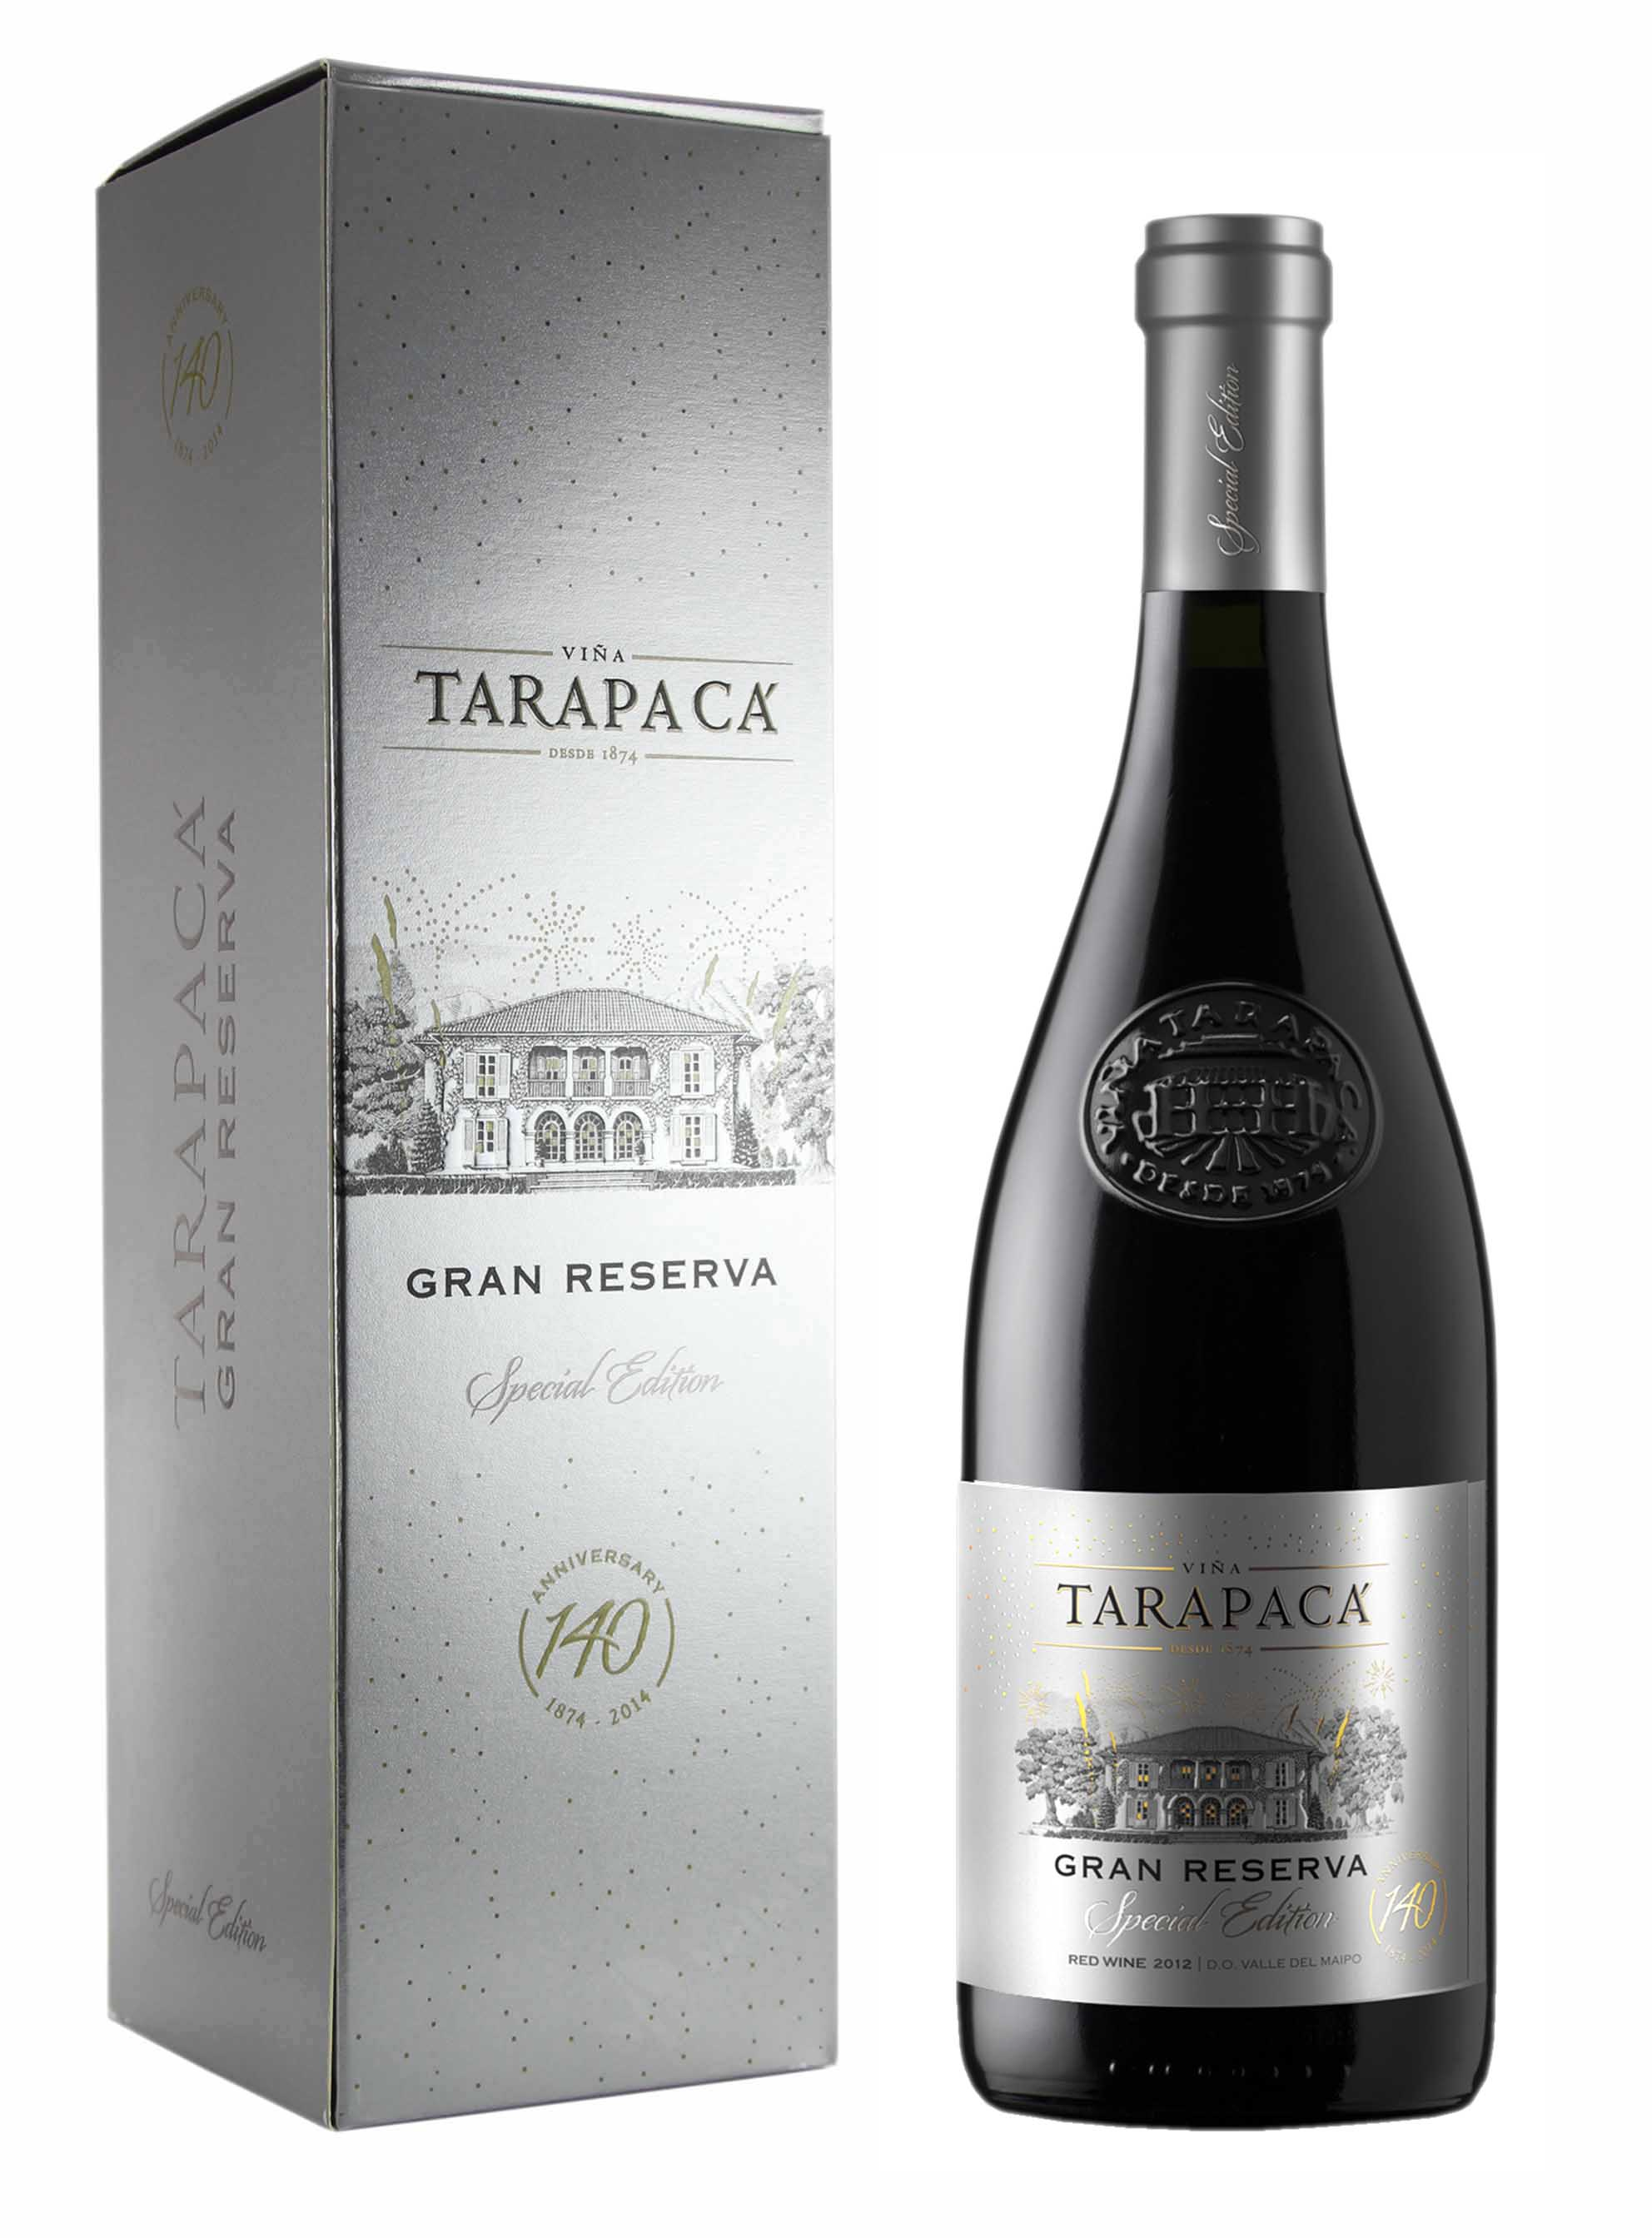 Cuvée, Anniversary Edition 140, DO Gran Reserva, 2012, Tarapacá, 0.75 l